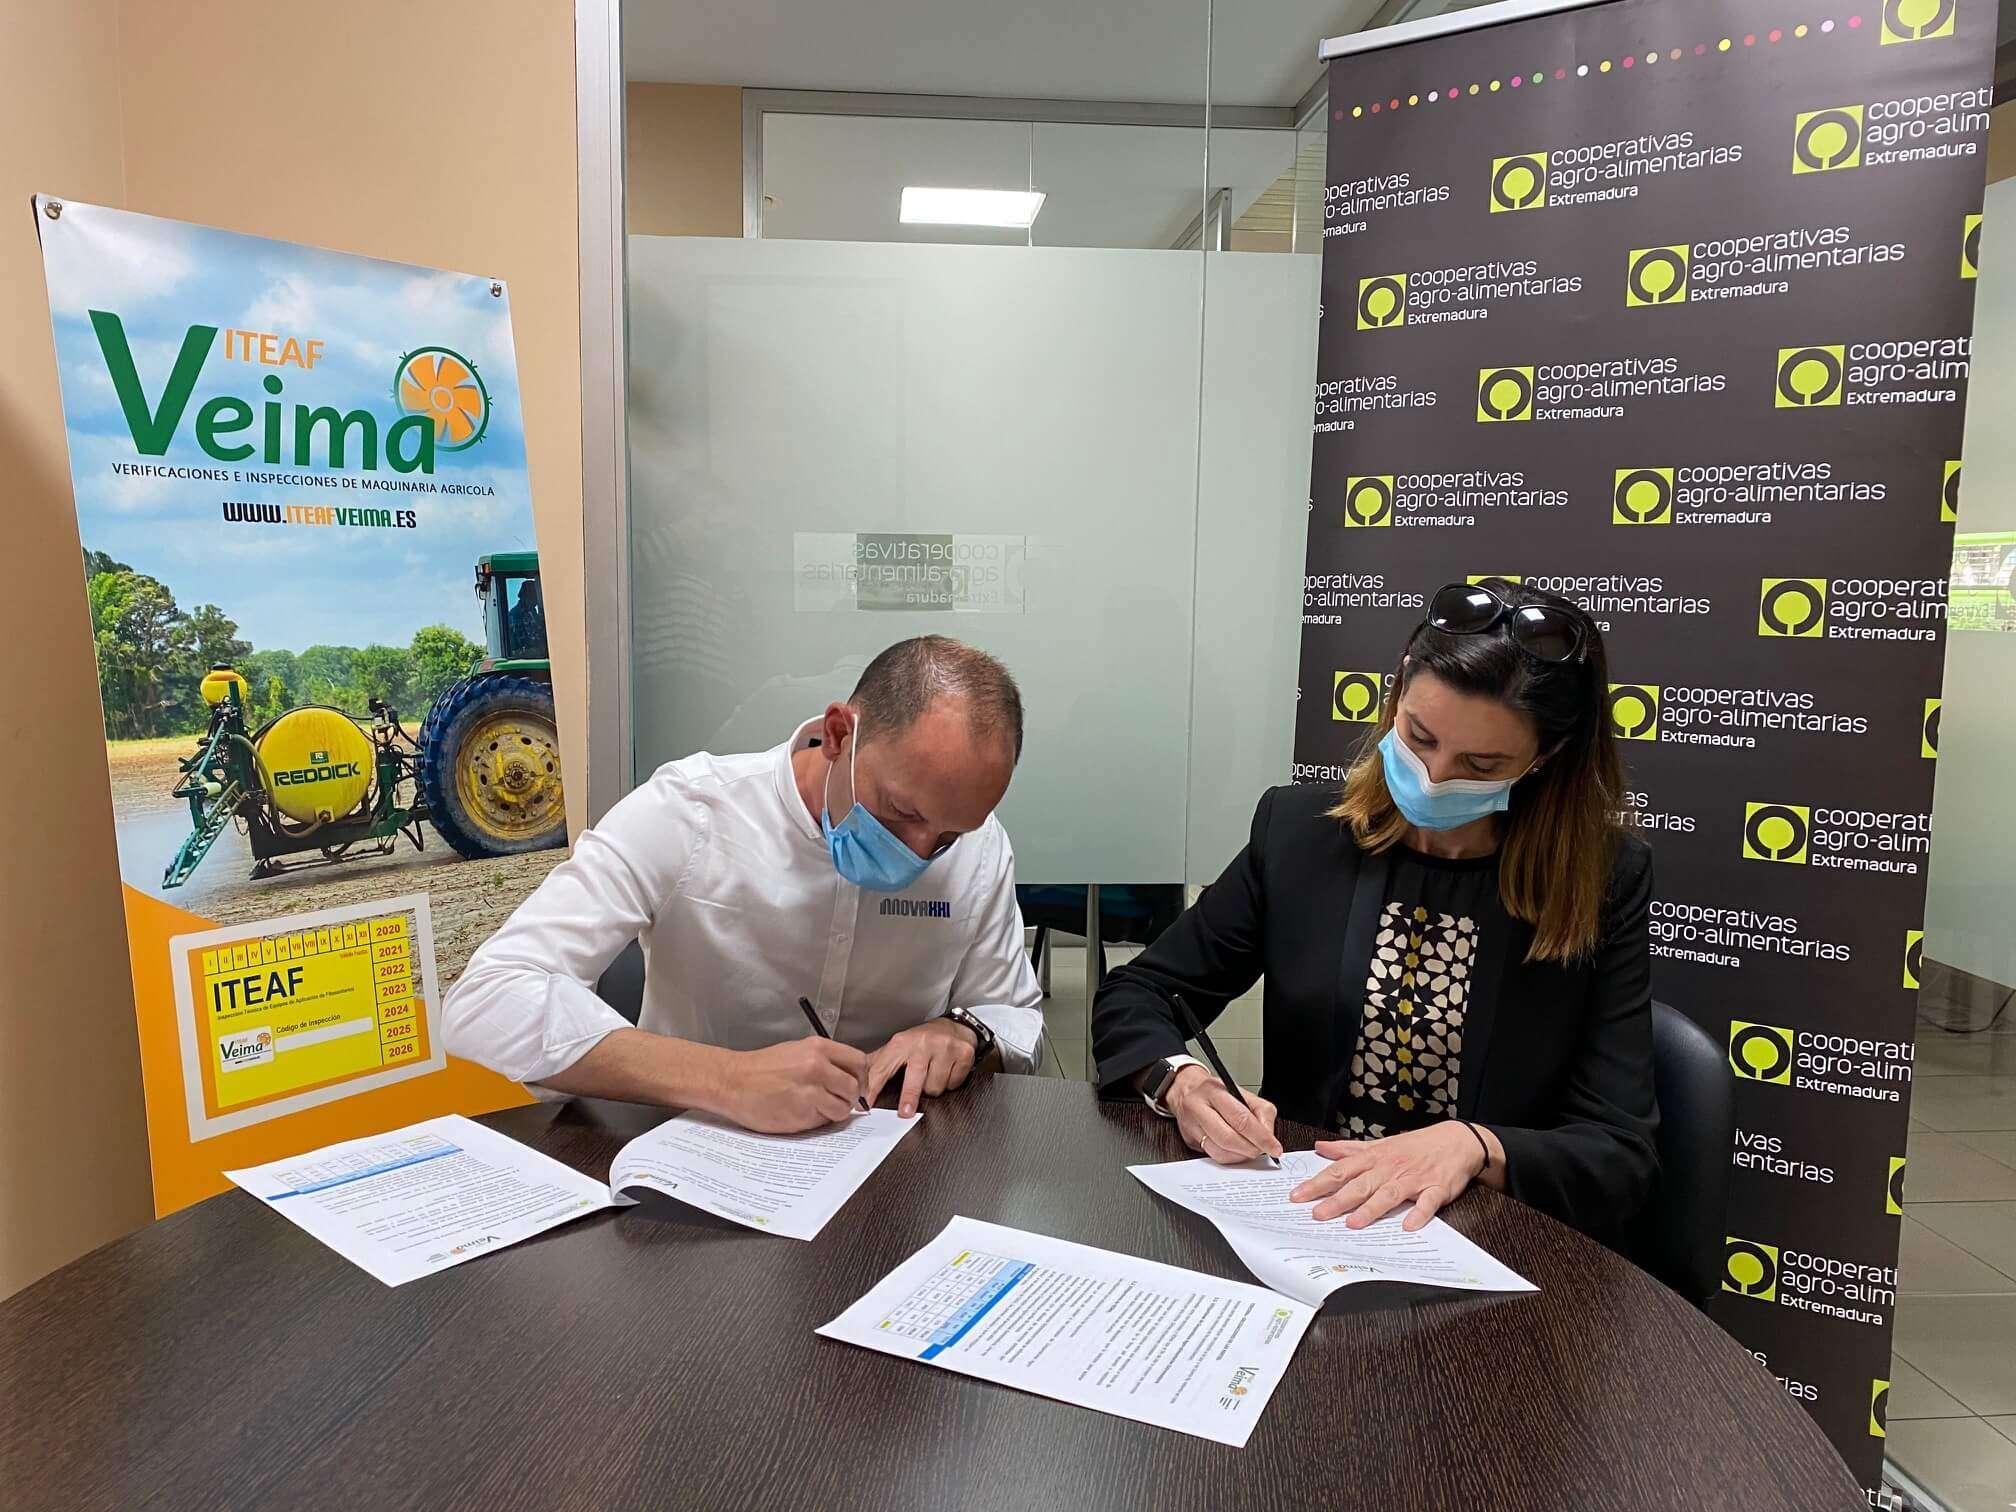 ITEAF VEIMA COOPERATIVAS AGRO-ALIMENTARIAS EXTREMADURA